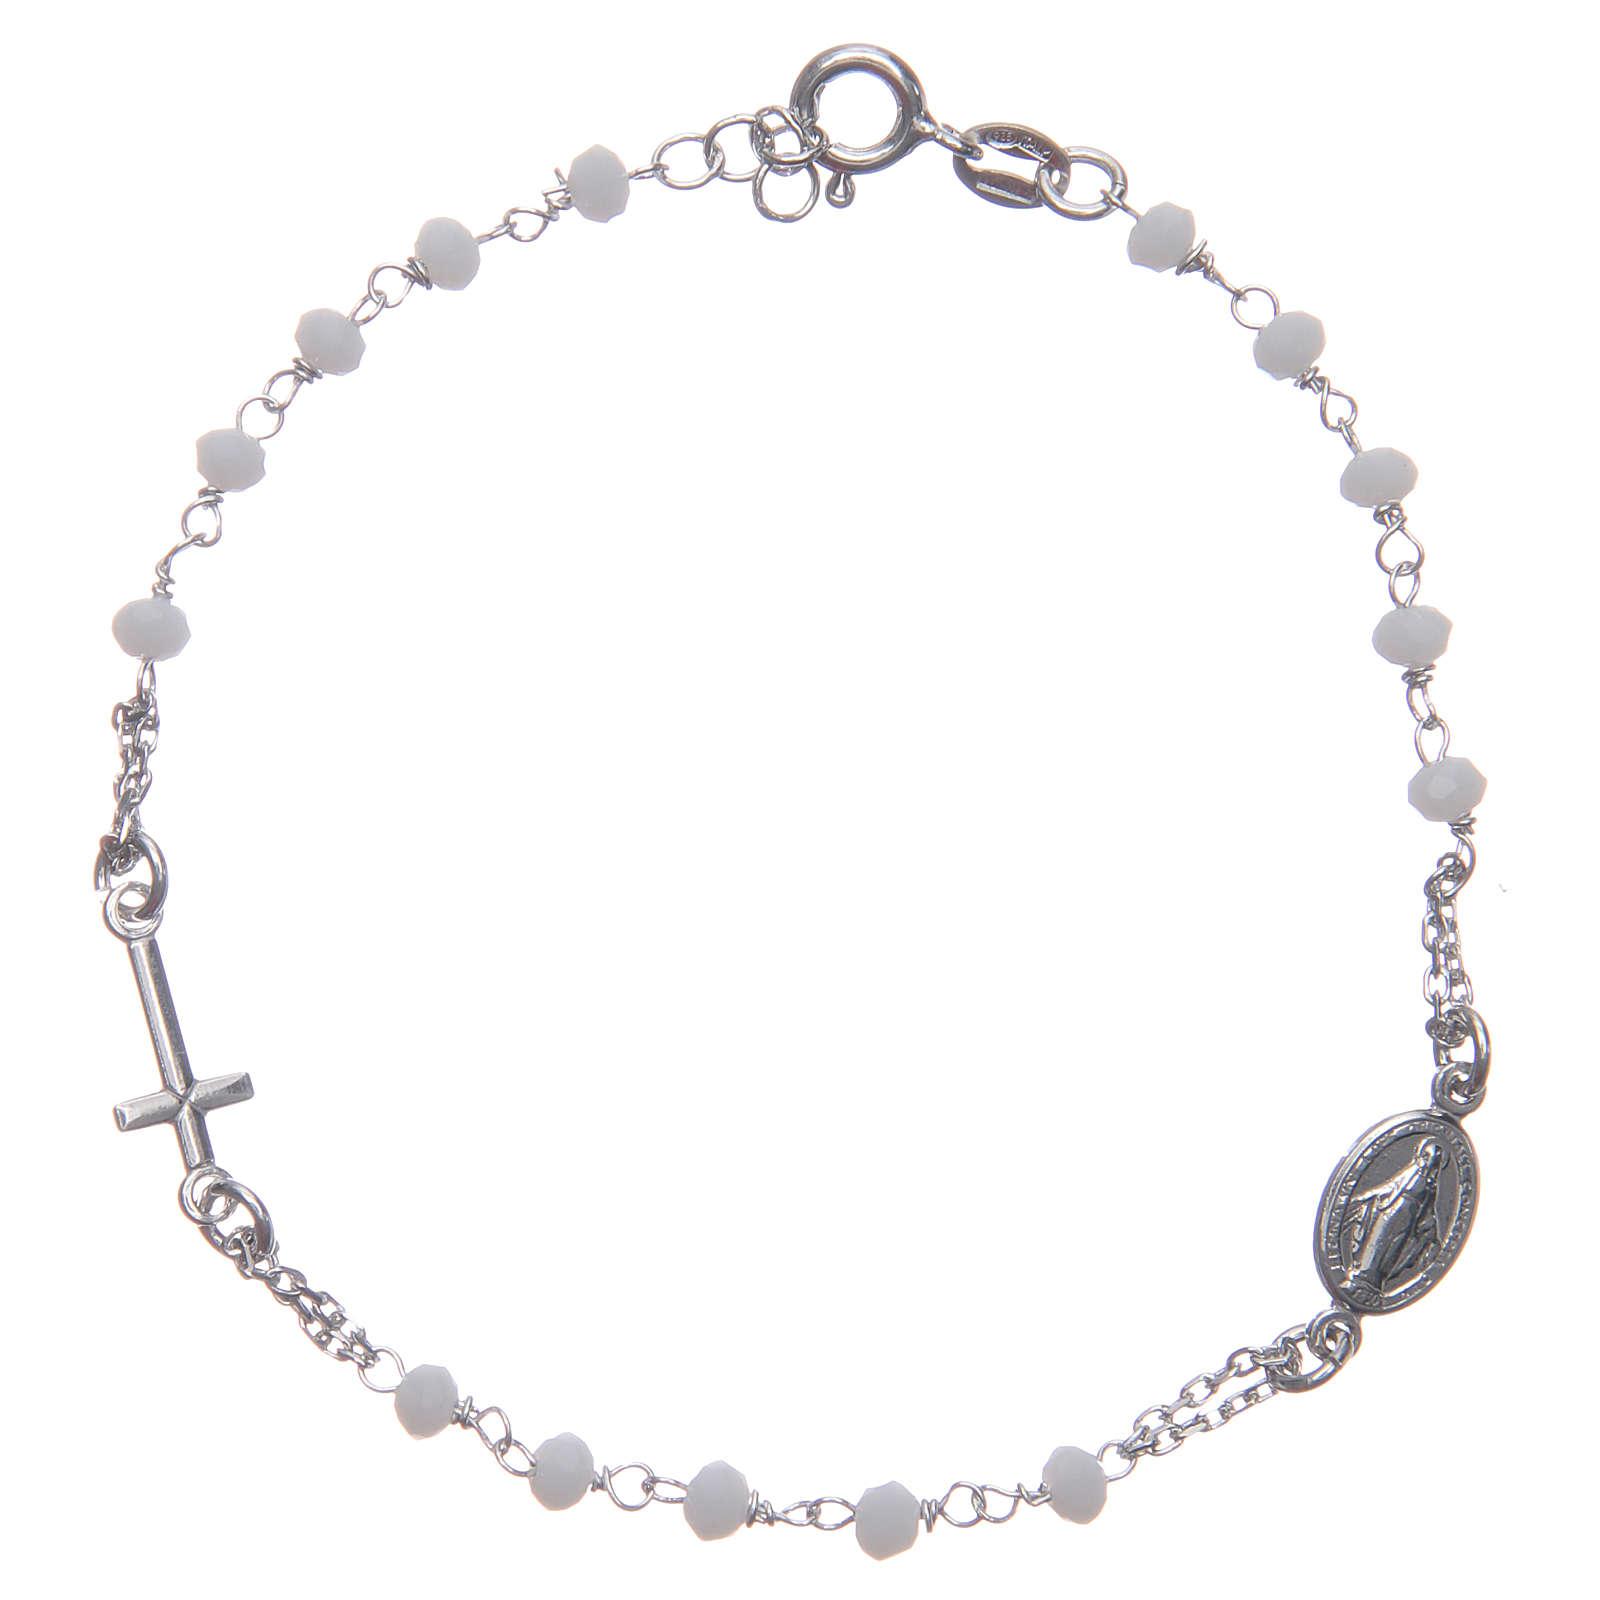 Bransoletka różaniec kolor biały Święta Rita srebro 925 4